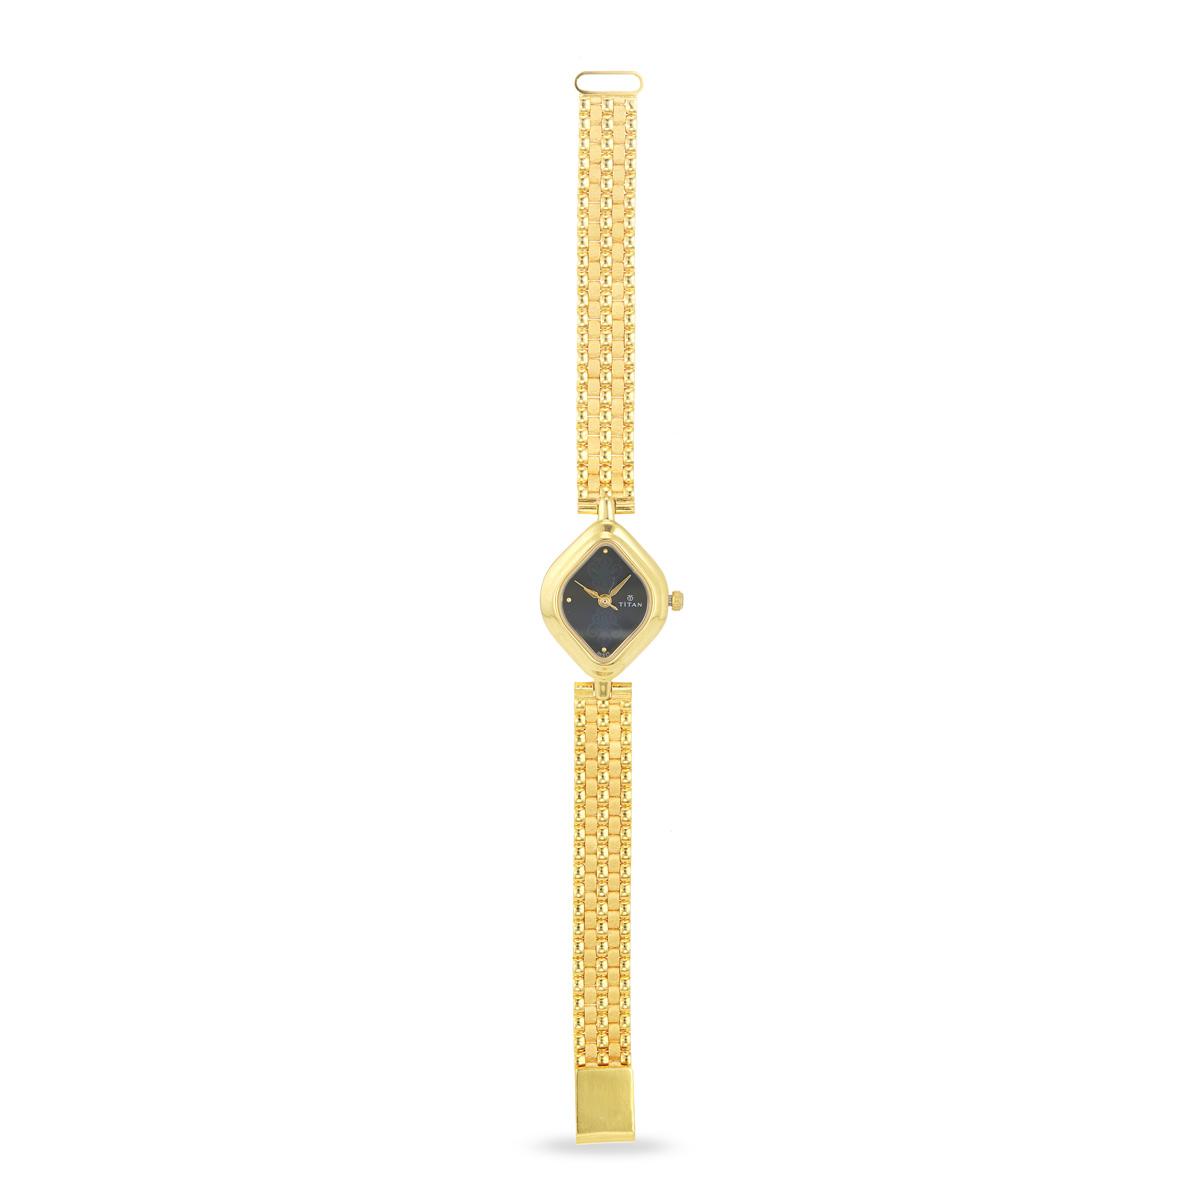 Pencil Thin Watch